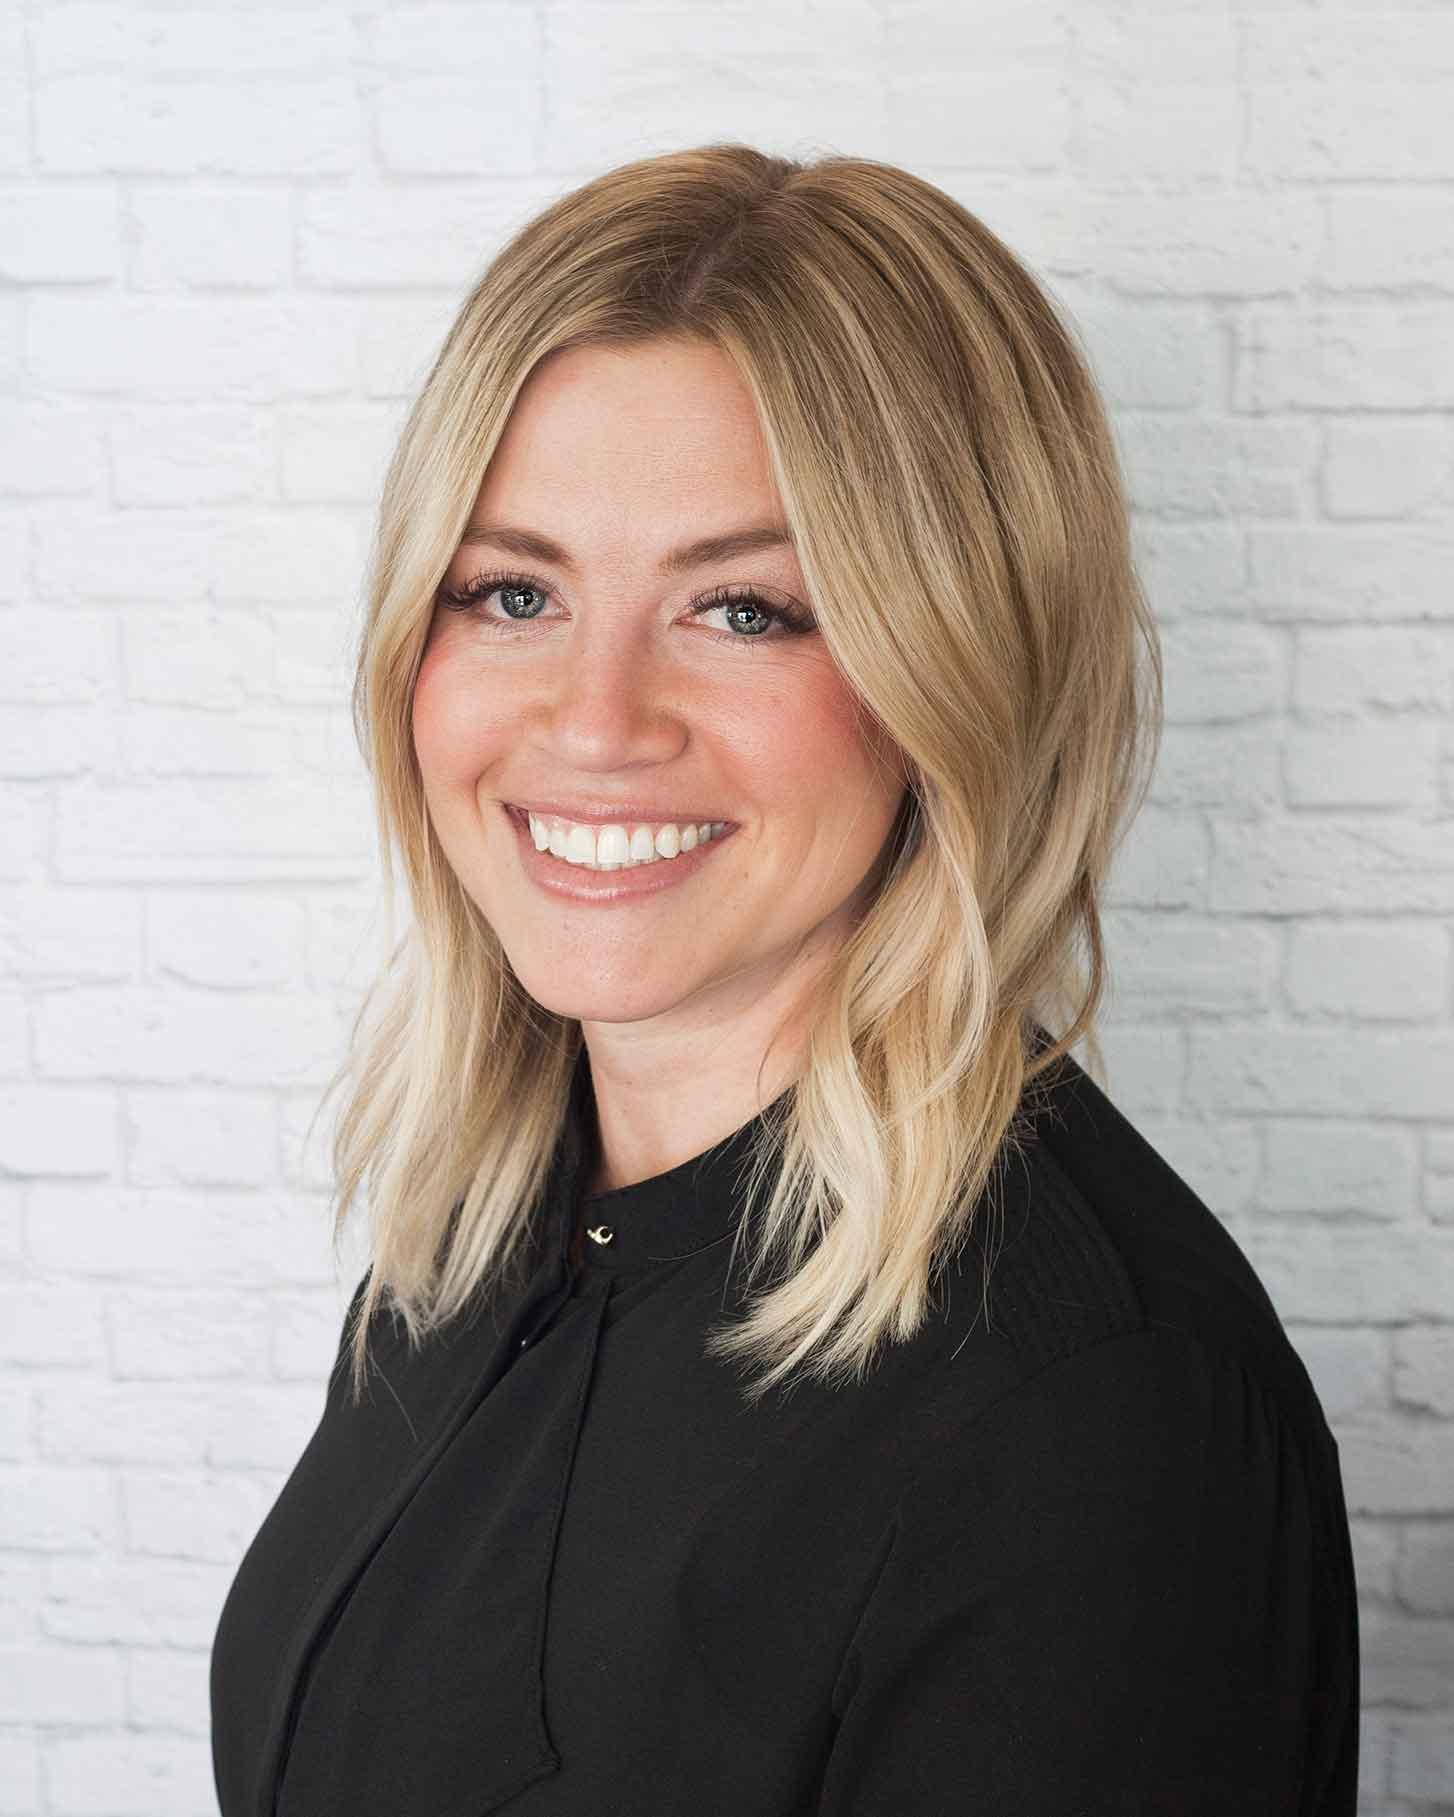 Kelli Jensen